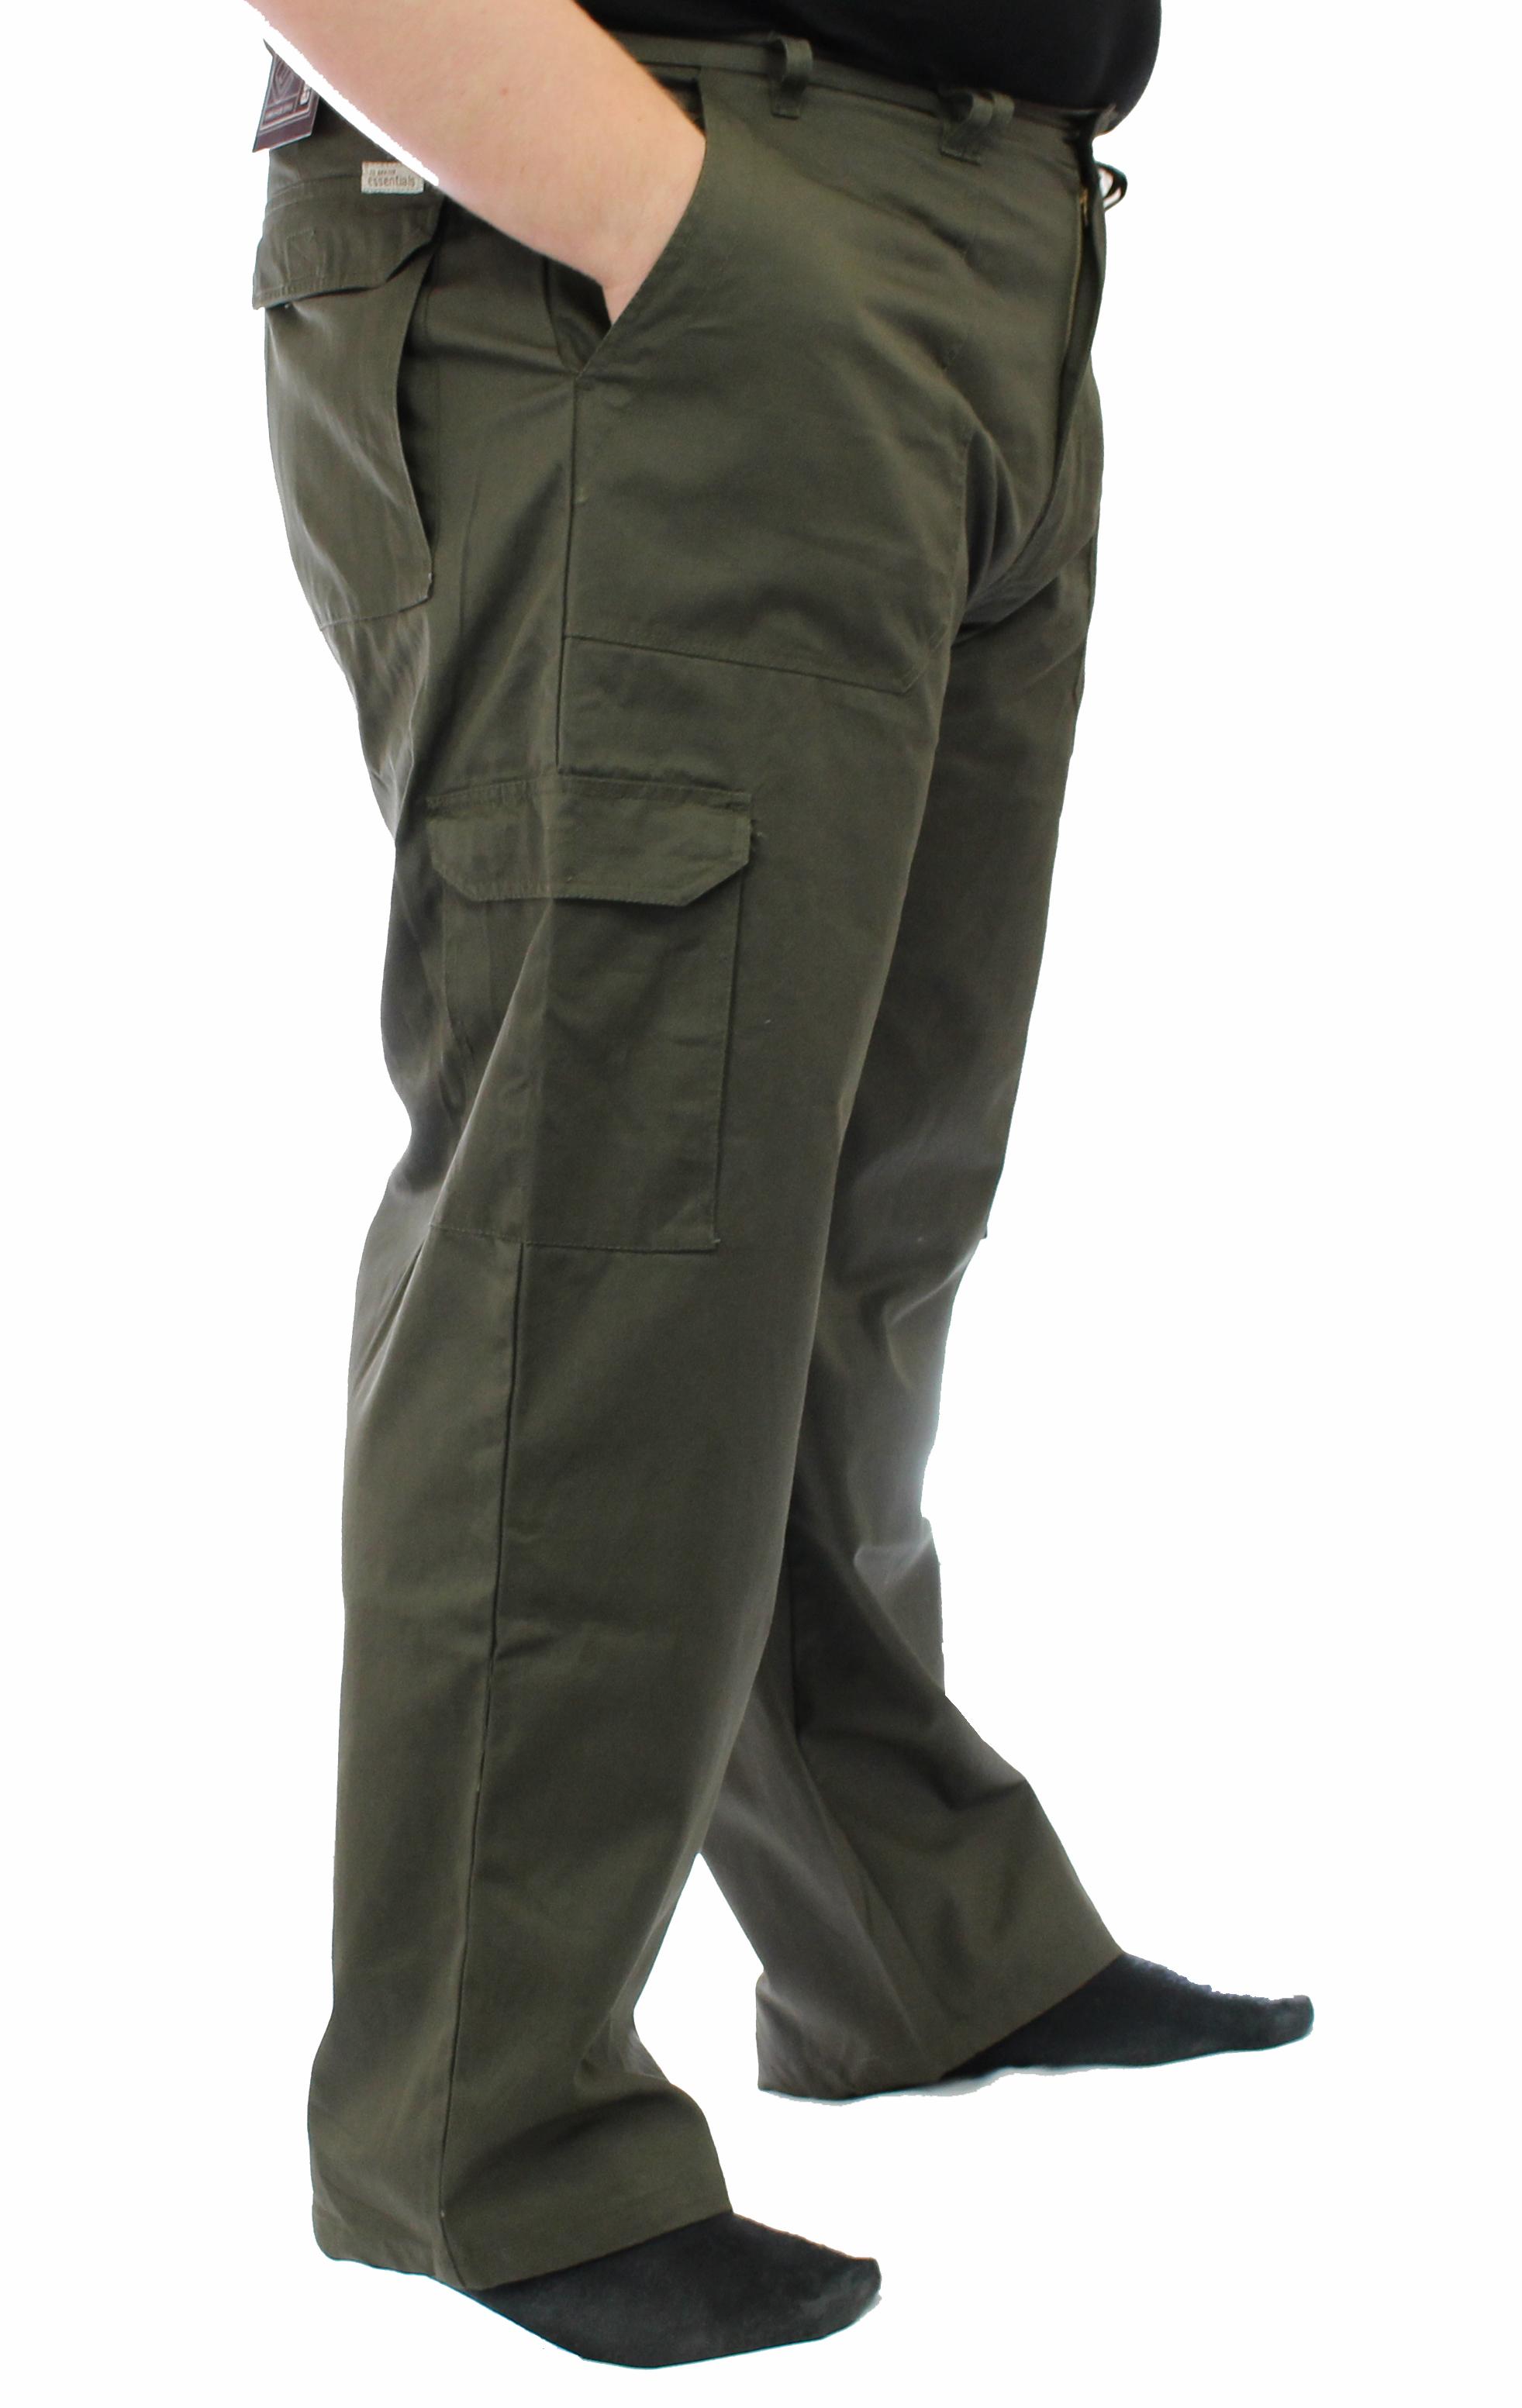 "Ed Baxter Victory - Heavy Duty Cargo Combat Trousers - Khaki - 52"" Waist, 30"" Leg"